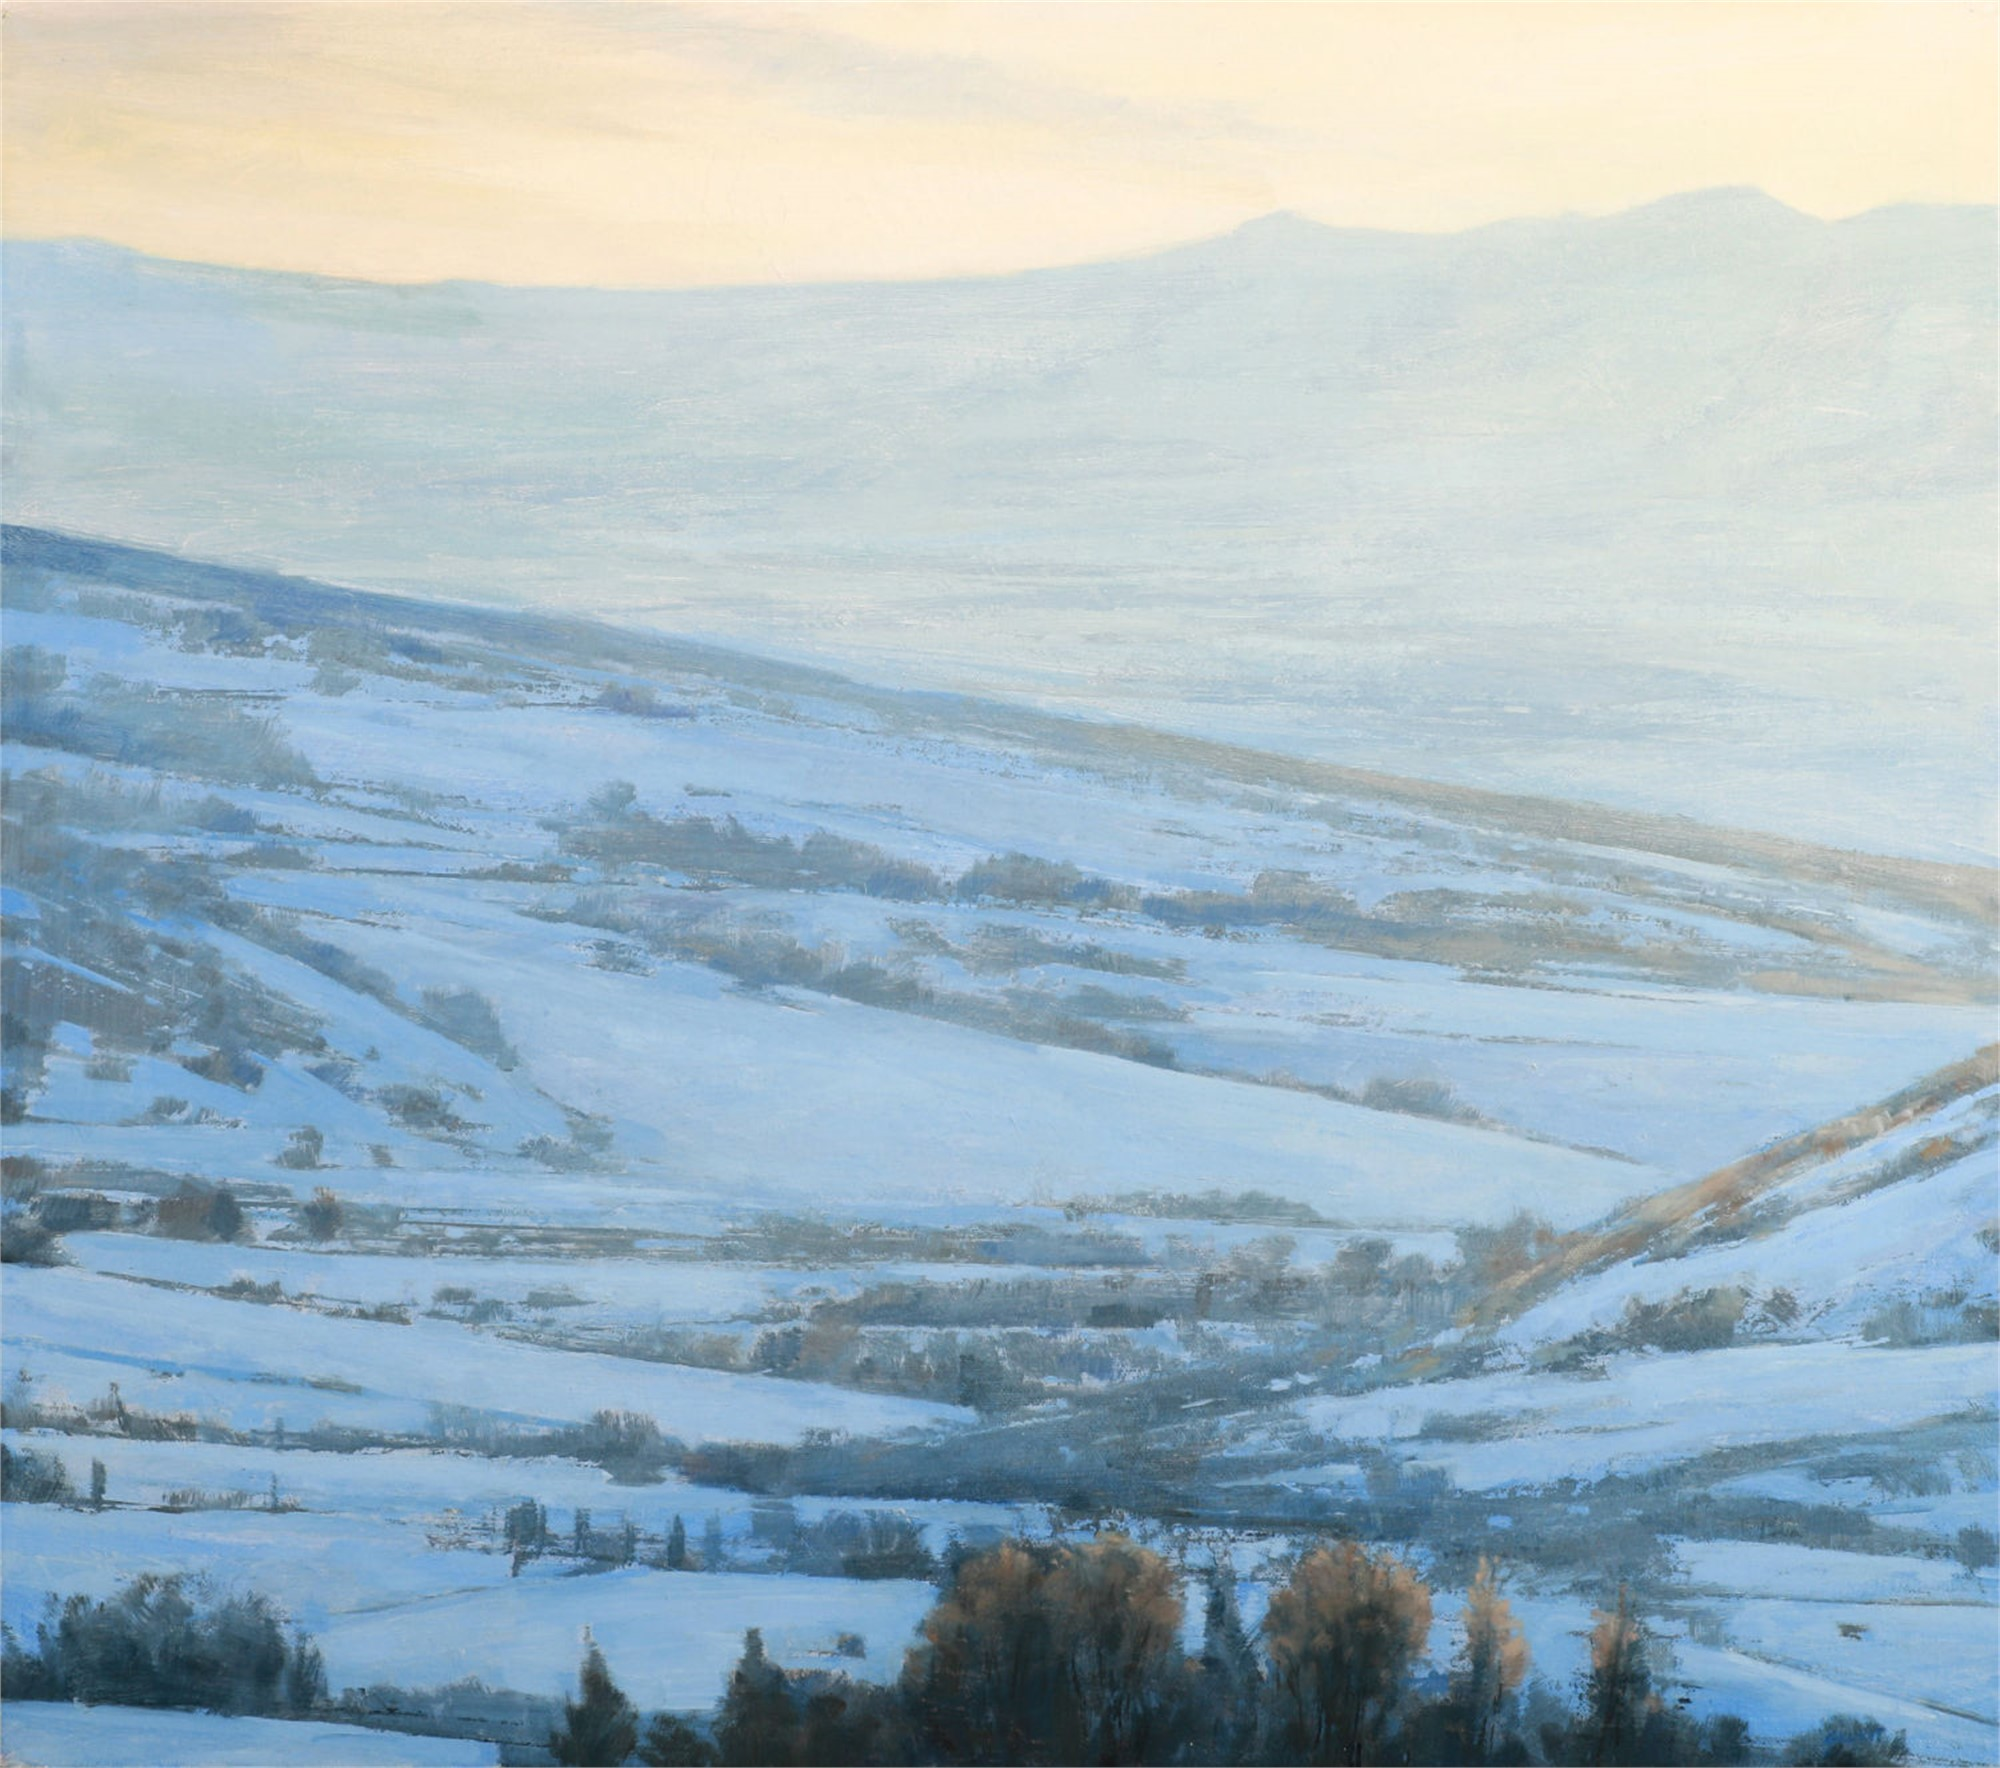 Winter Sunset 2 by Andrzej Skorut